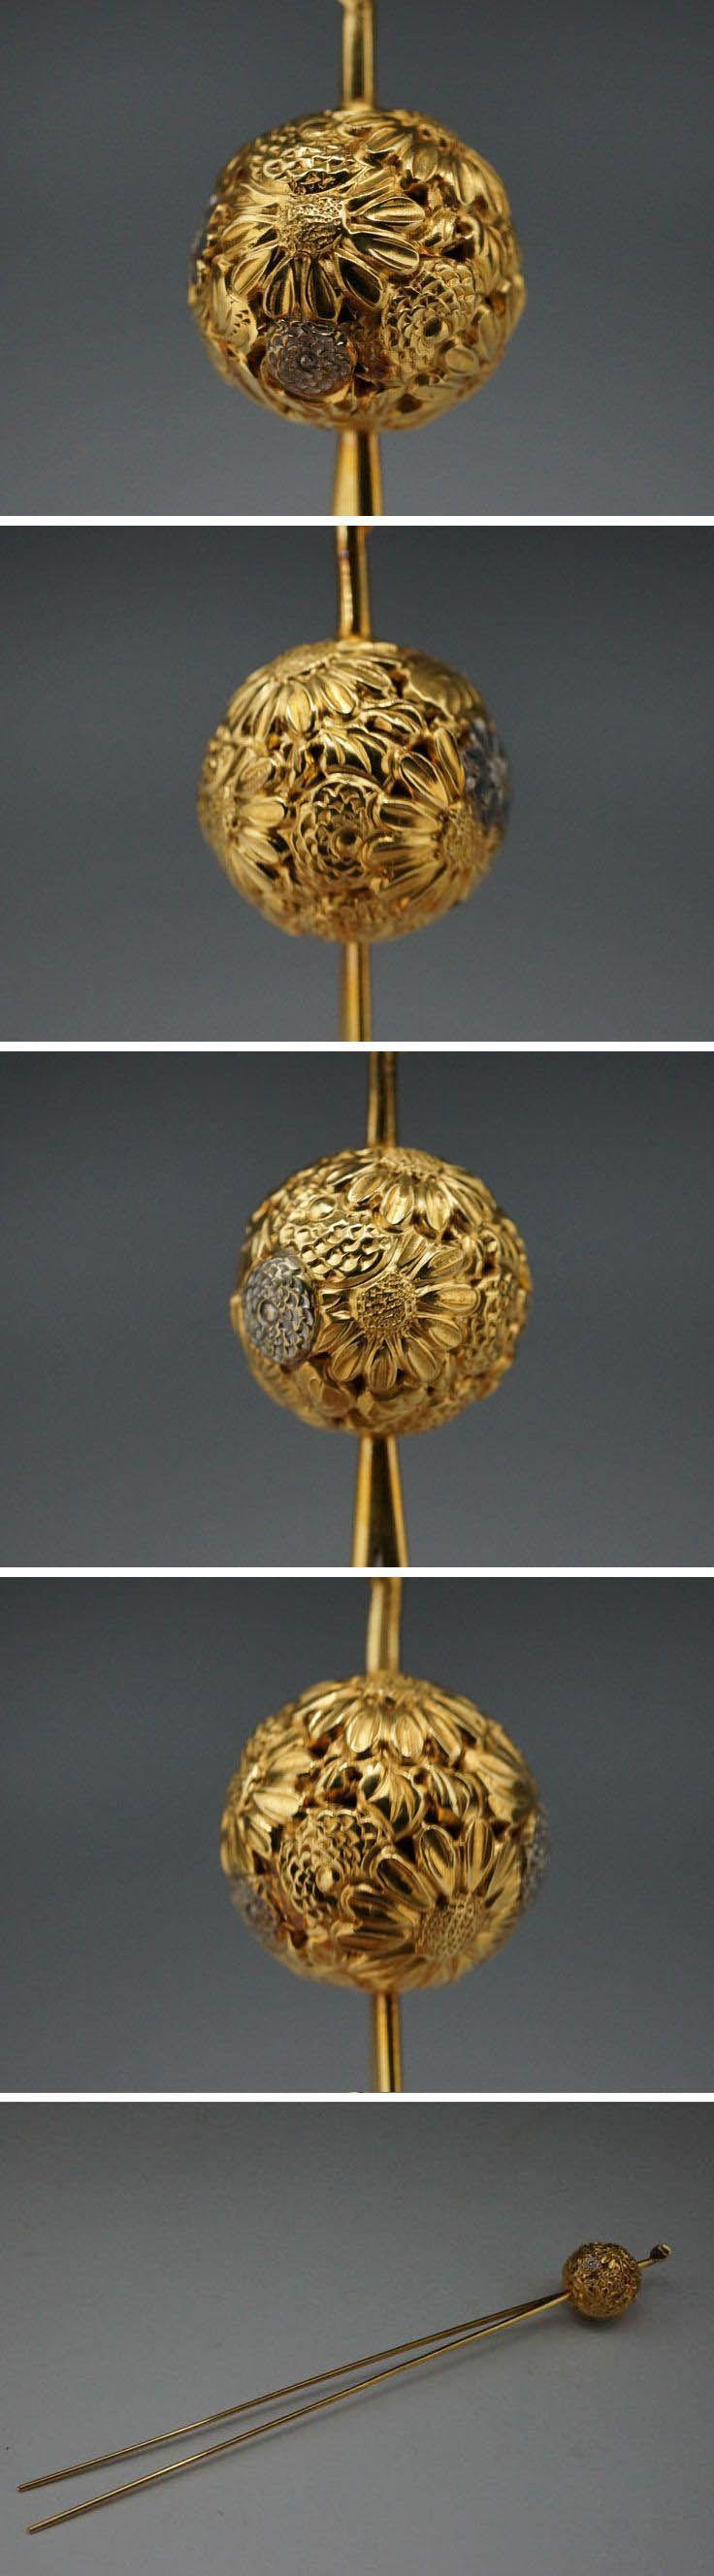 Japanese gold hair ornament (kanzashi)